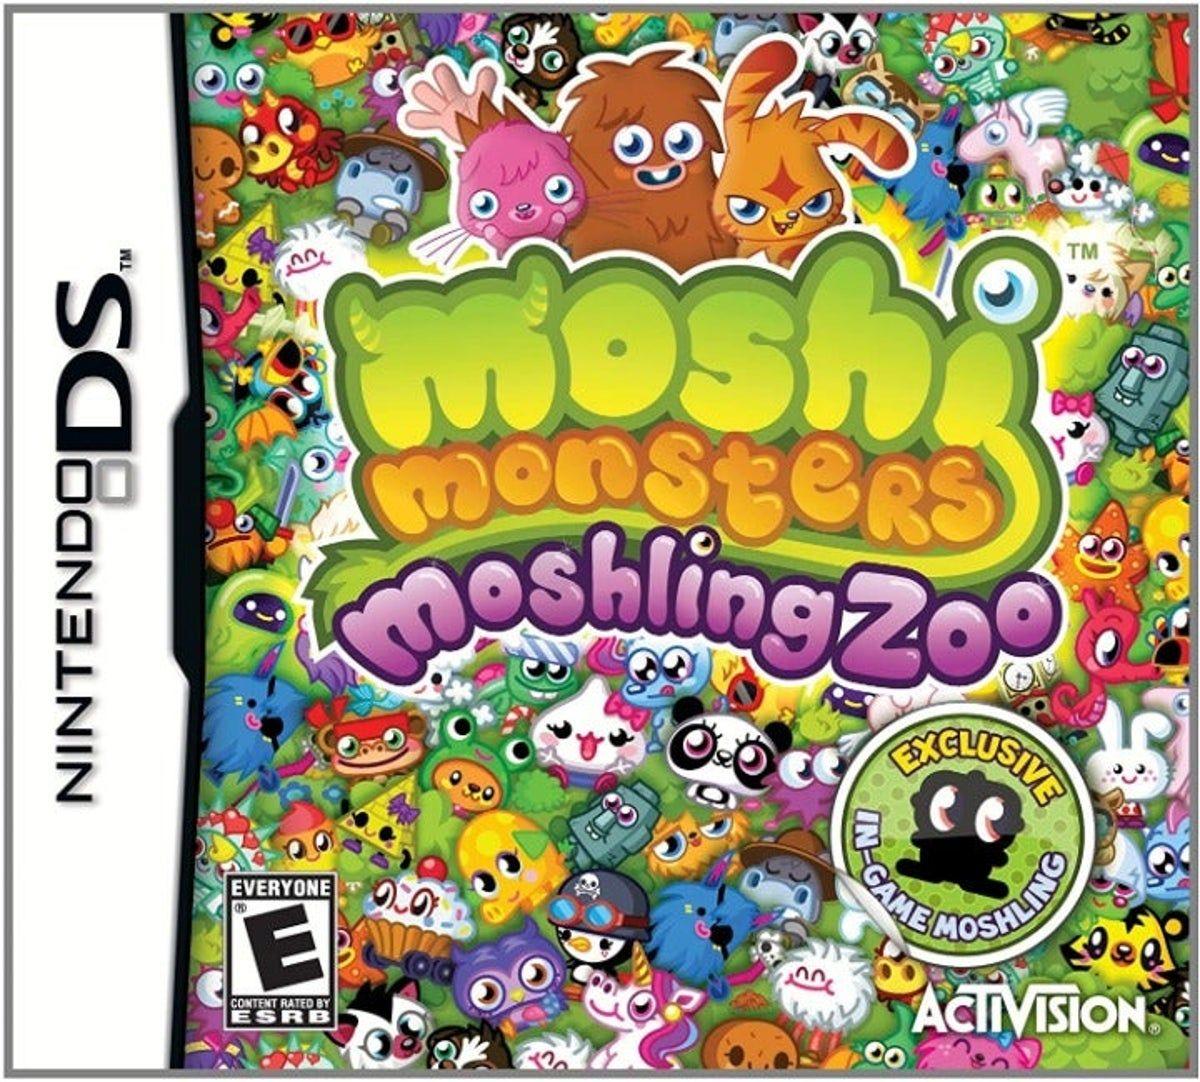 Nintendo DS Girls Lot of Games in 2020 Nintendo ds games